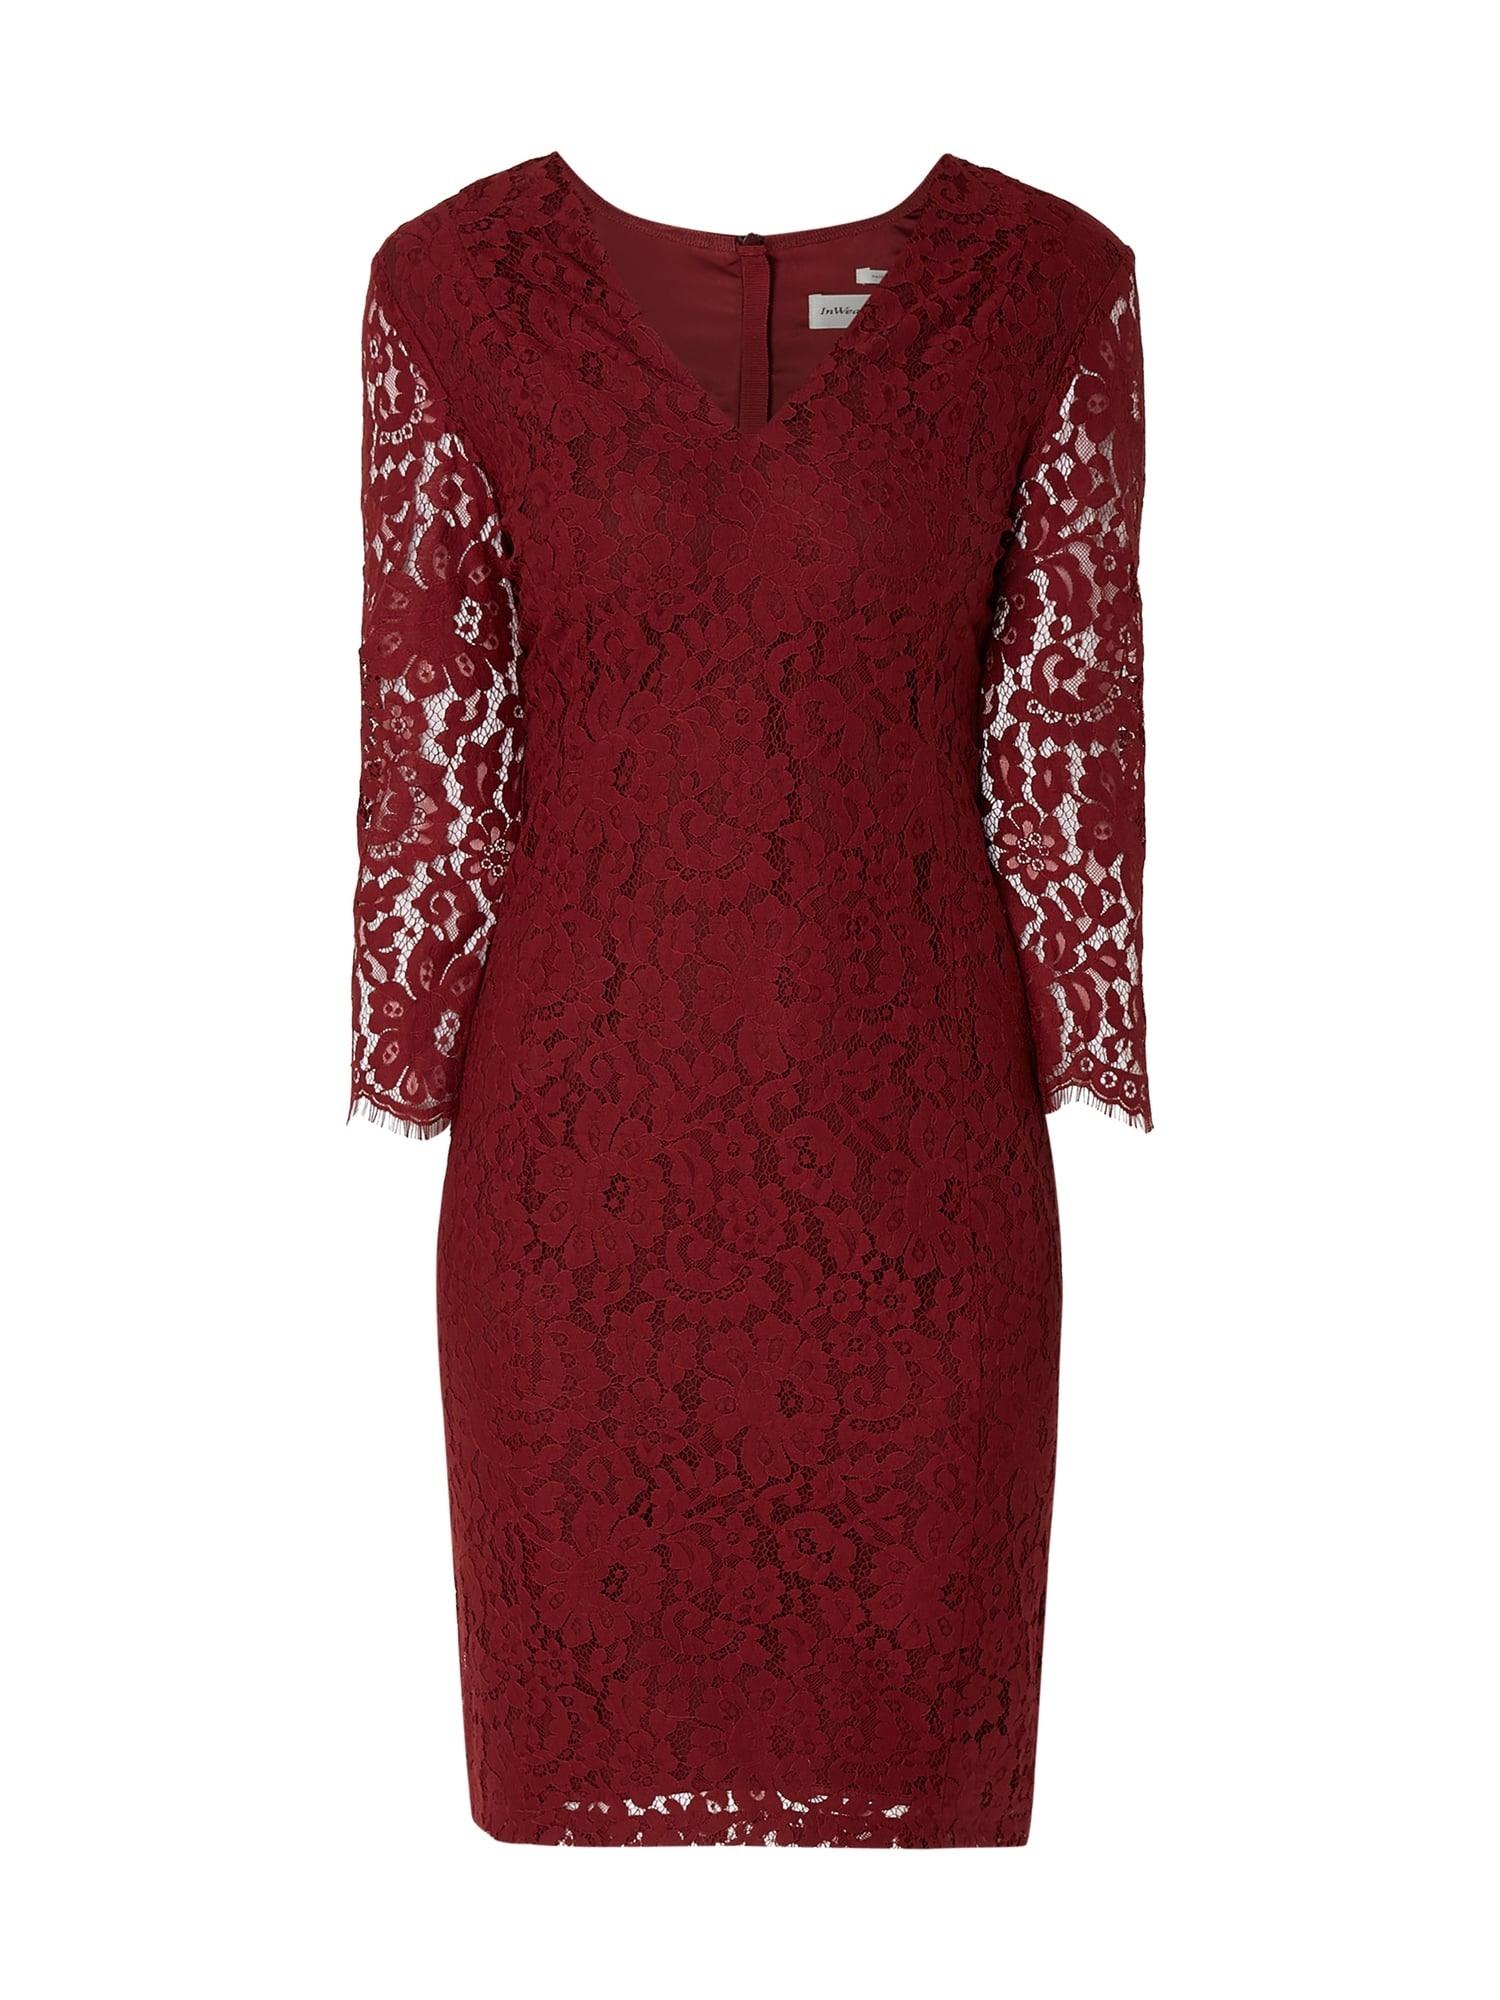 13 Einfach Bordeaux Kleid Spitze VertriebFormal Top Bordeaux Kleid Spitze Bester Preis